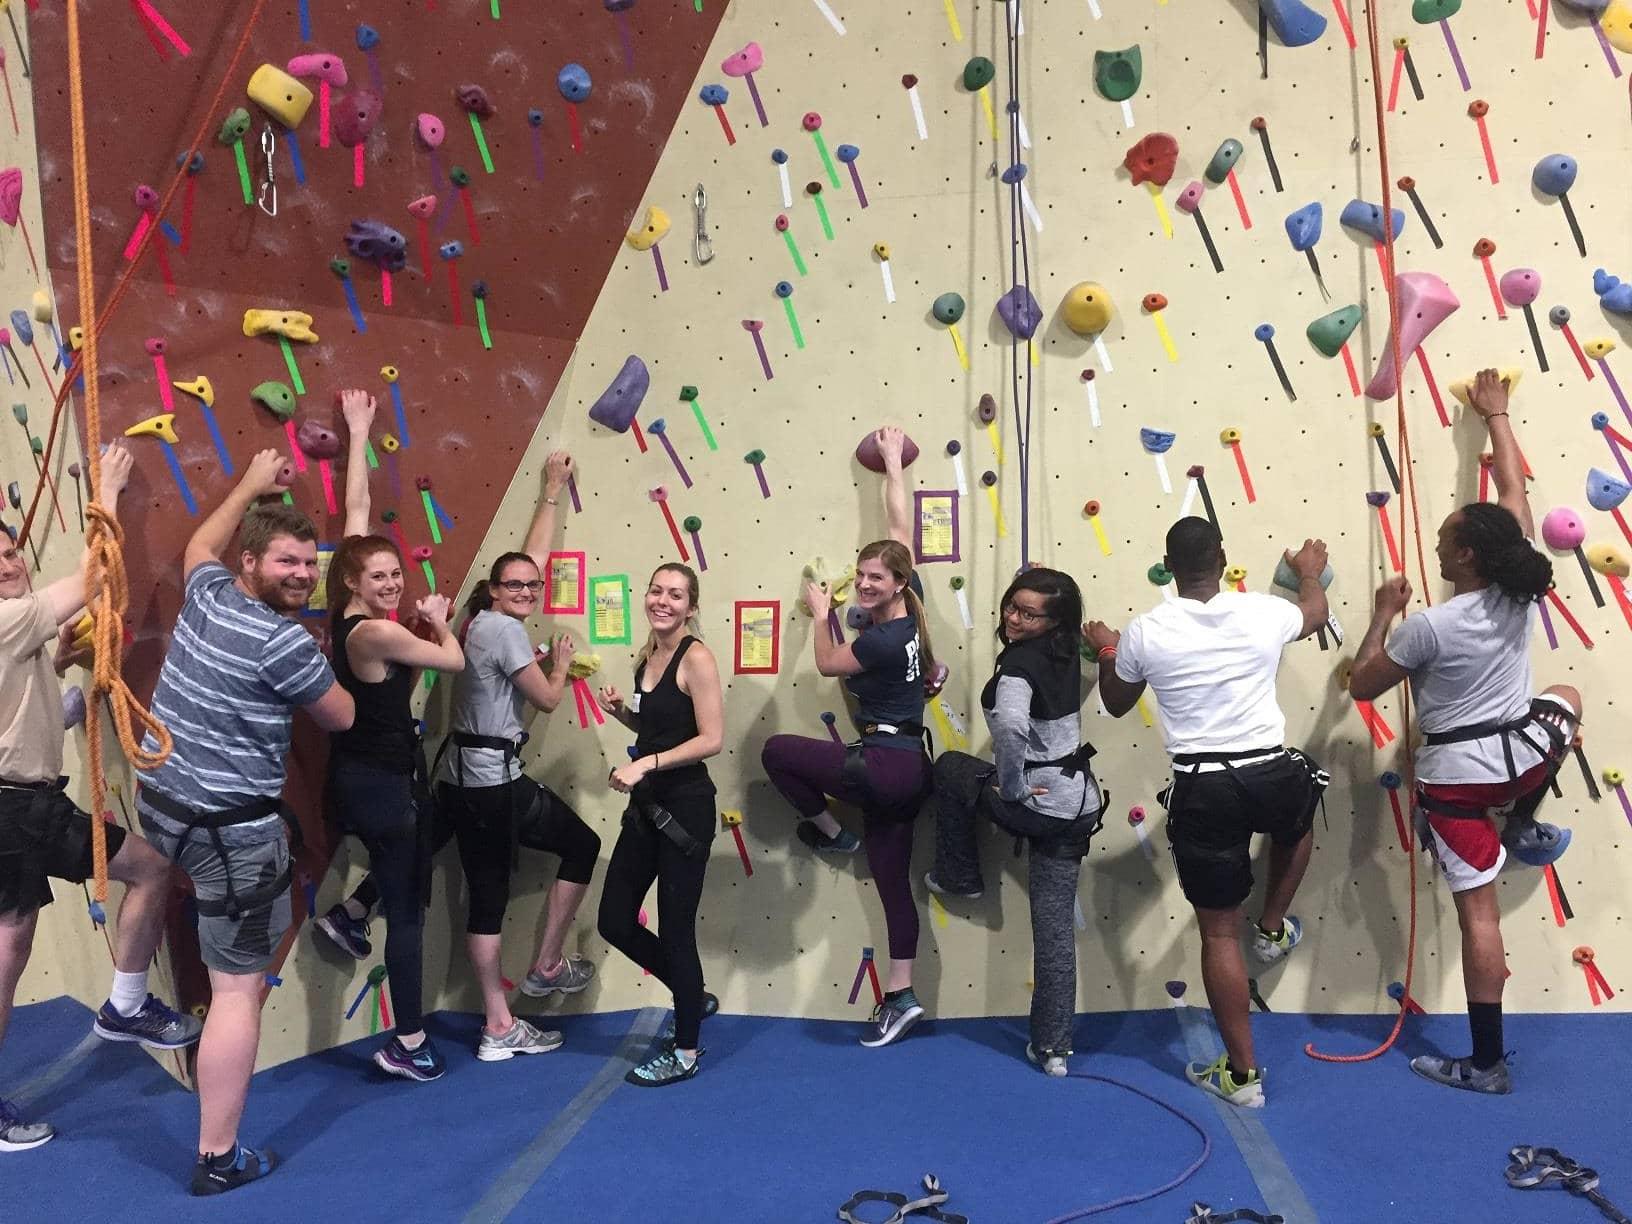 rock-climbing-group-2-w1632.jpg